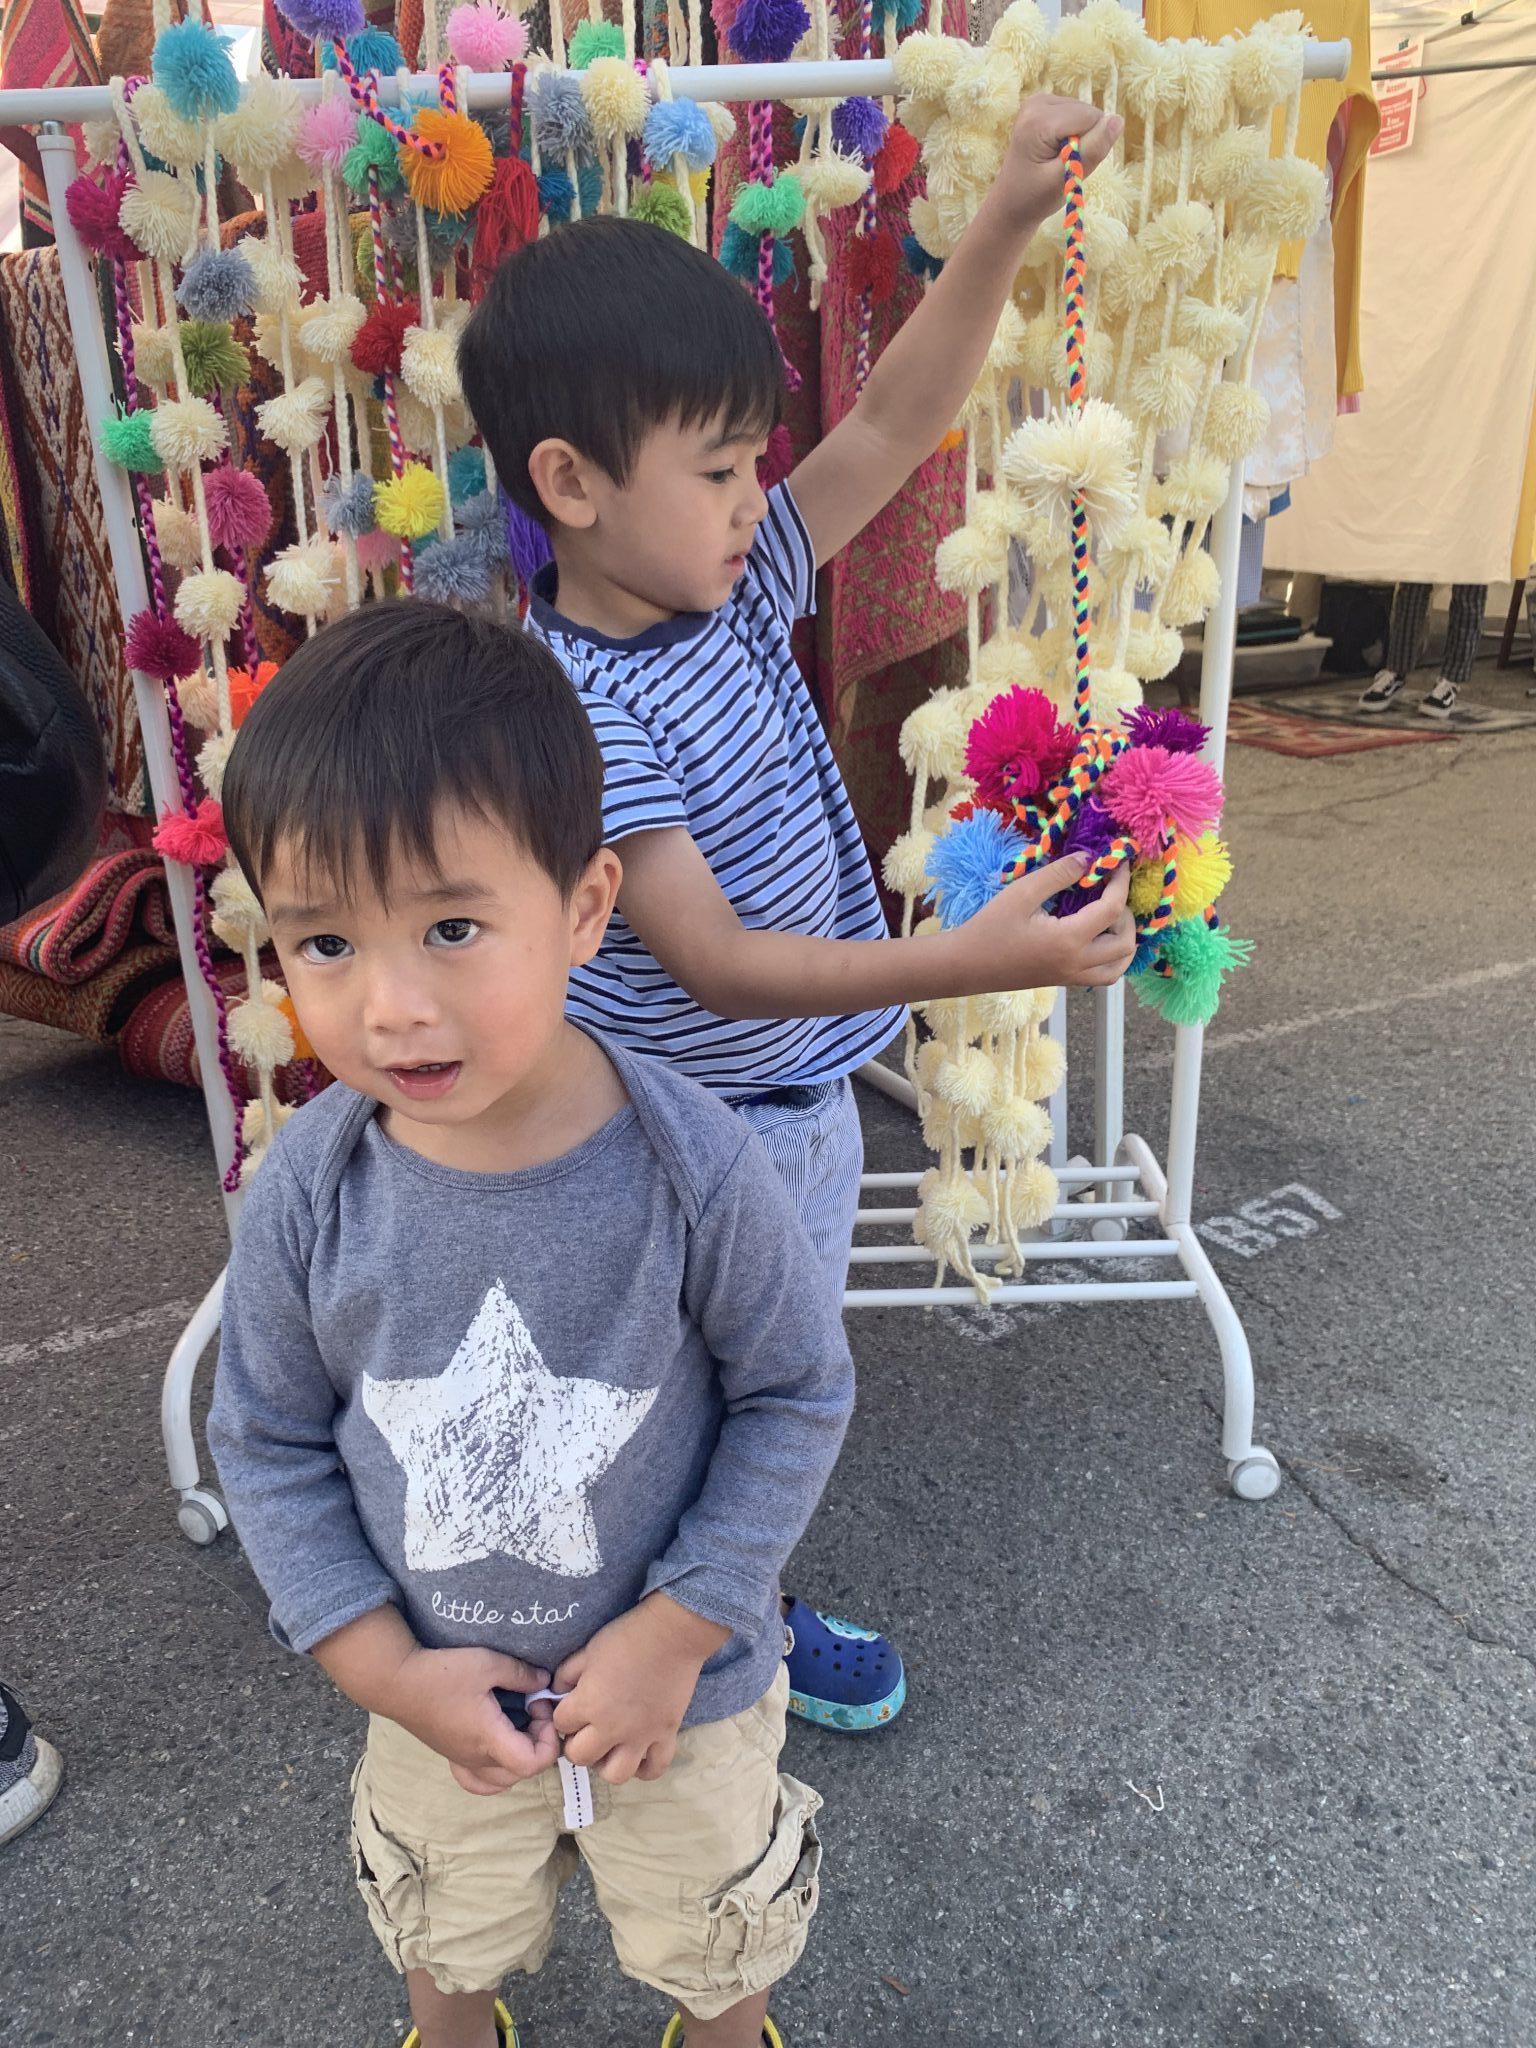 Melrose Mornings' Kids Events